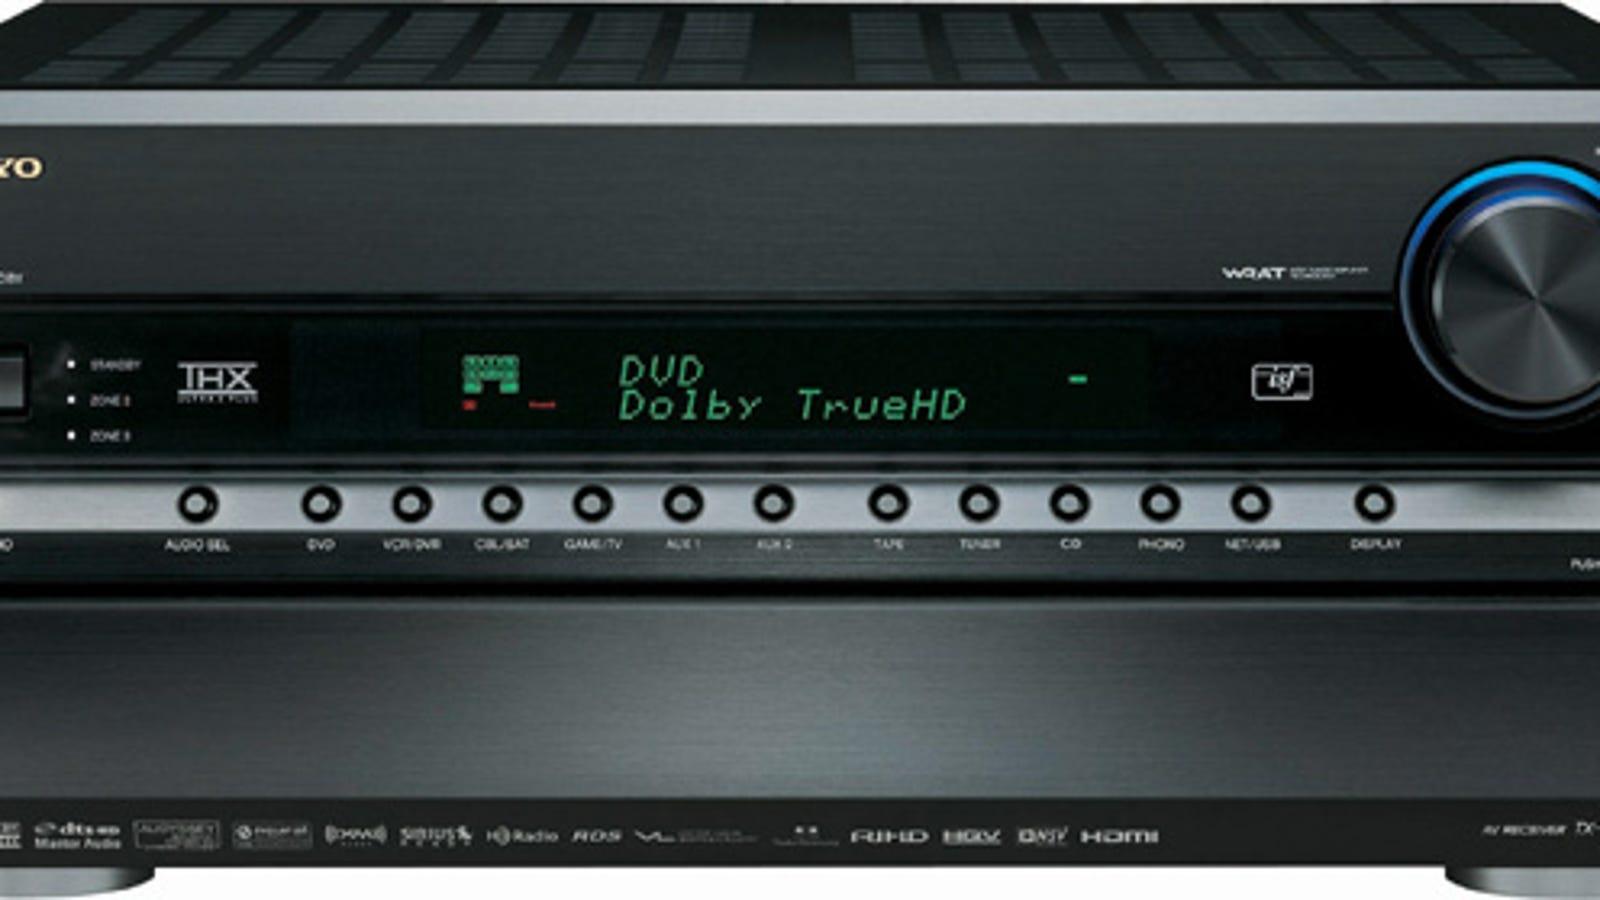 Onkyo's TX-SR876 and TX-NR906: Top-of-the-Line THX Ultra2